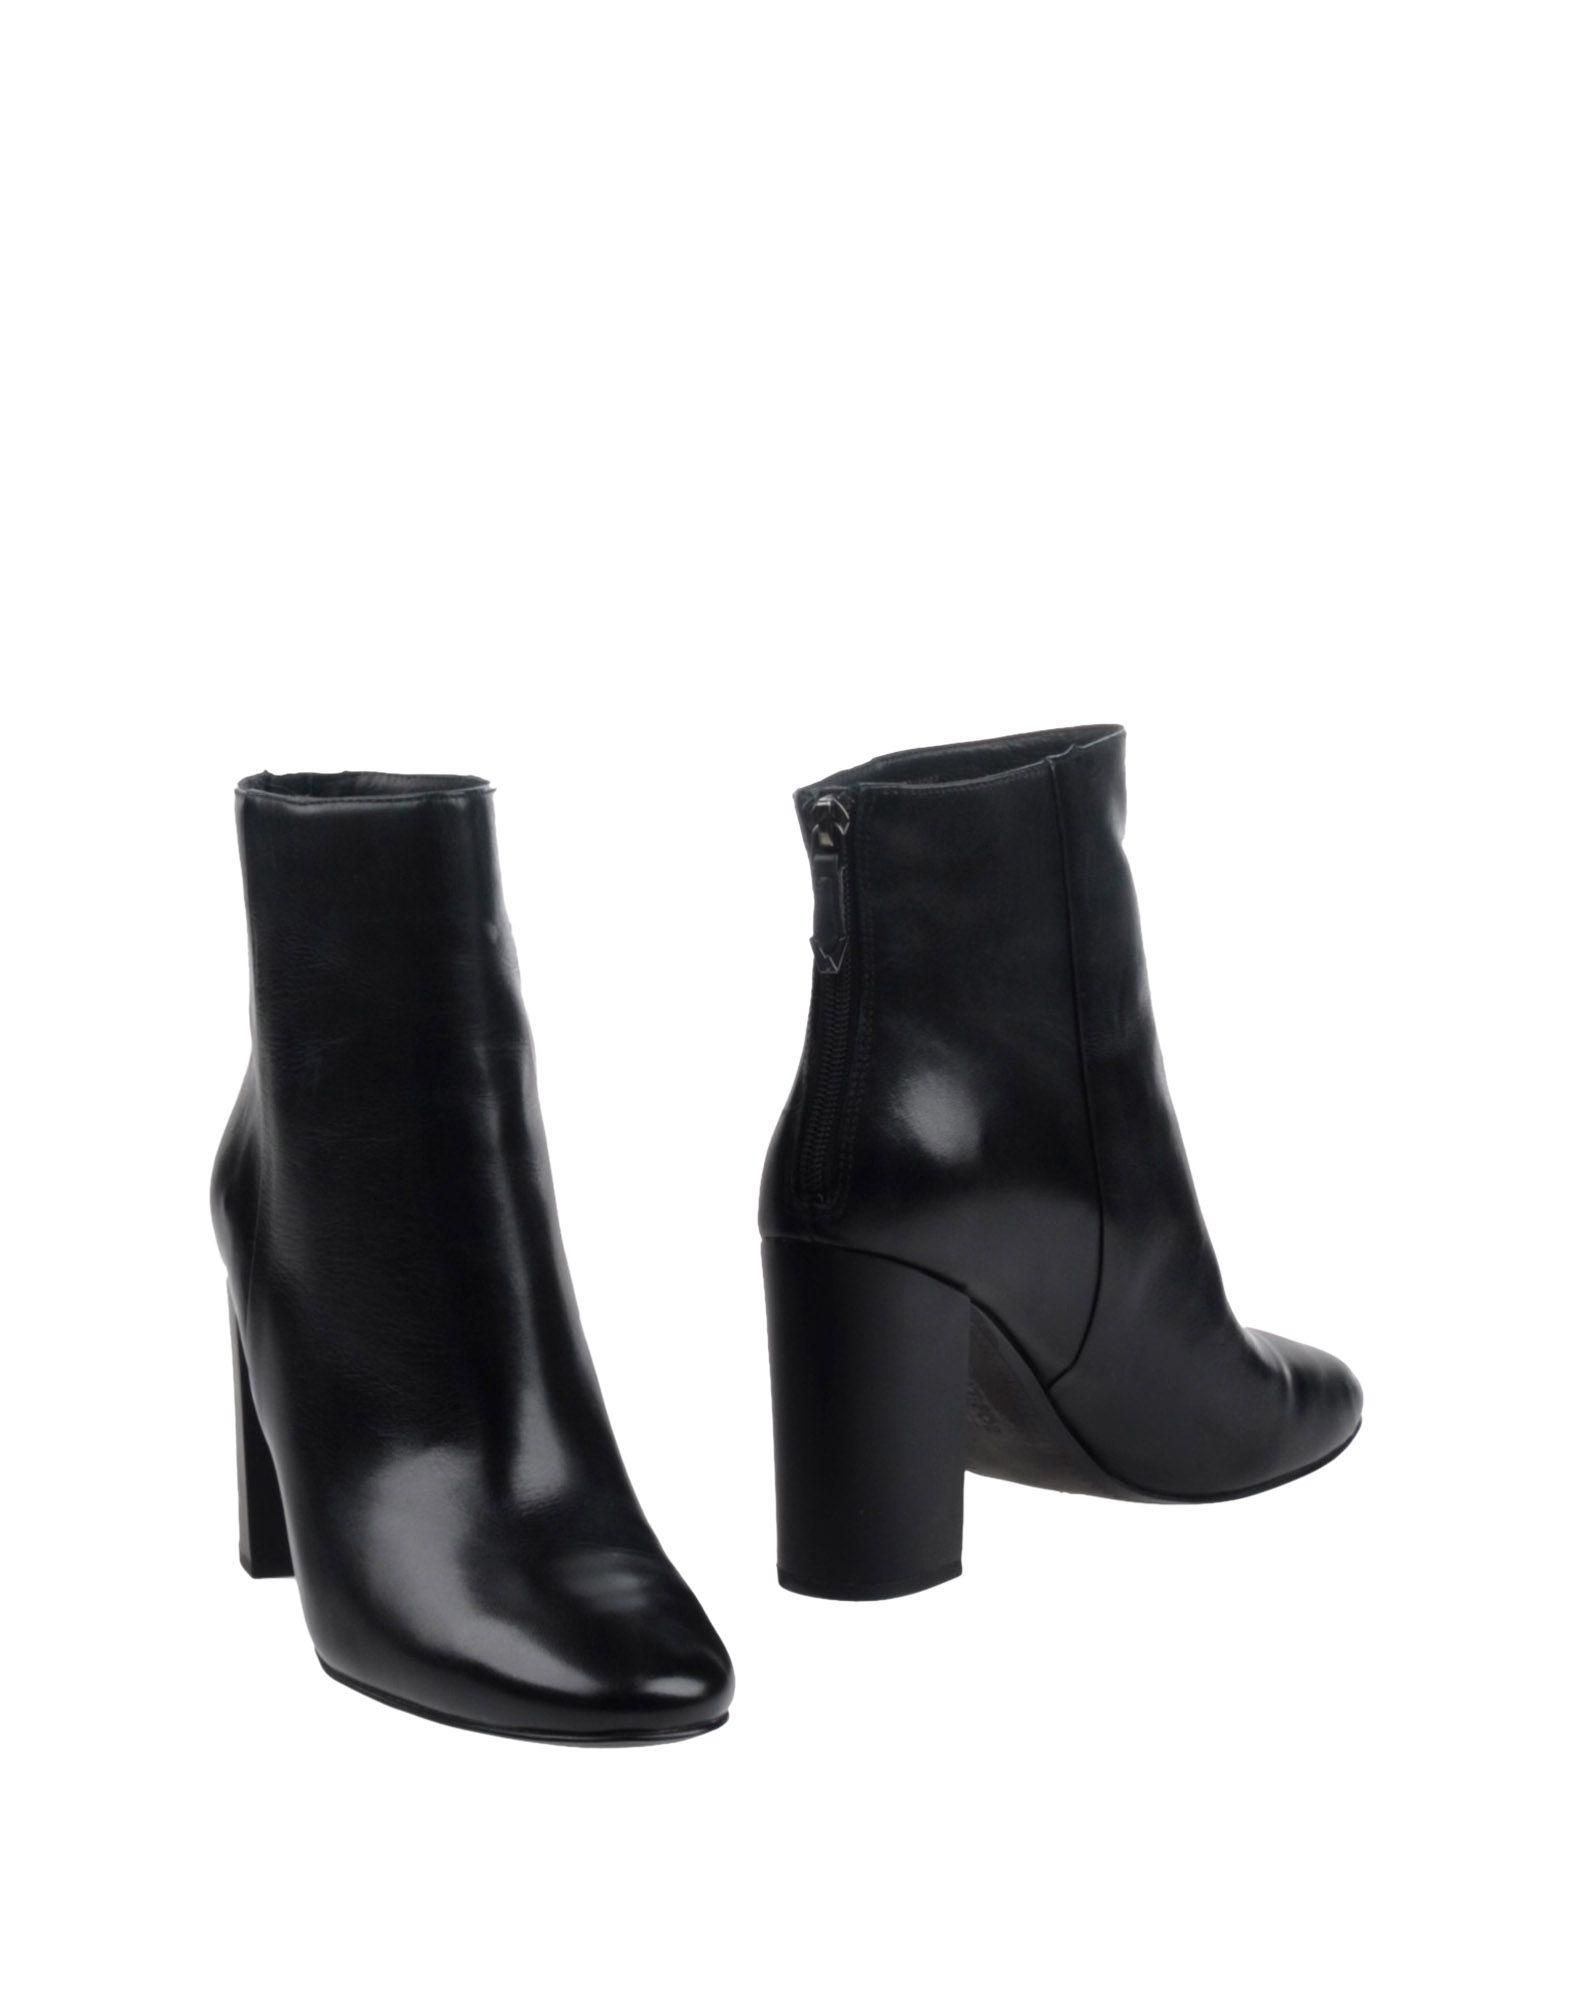 ФОТО what for Полусапоги и высокие ботинки